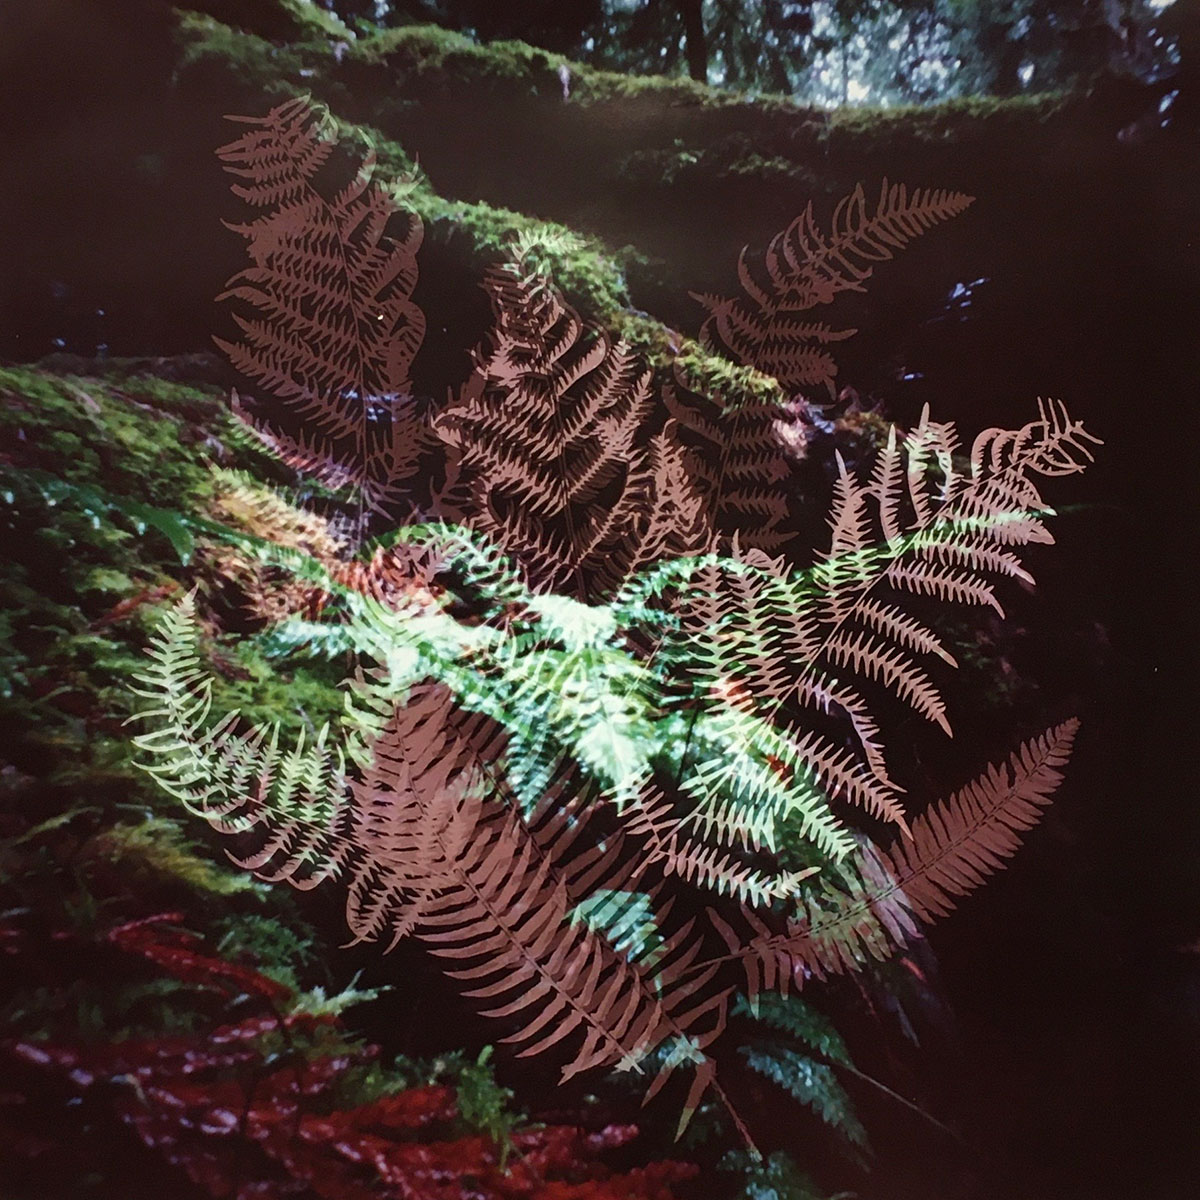 Understory 11.2, Bowen Island, British Columbia (2020)